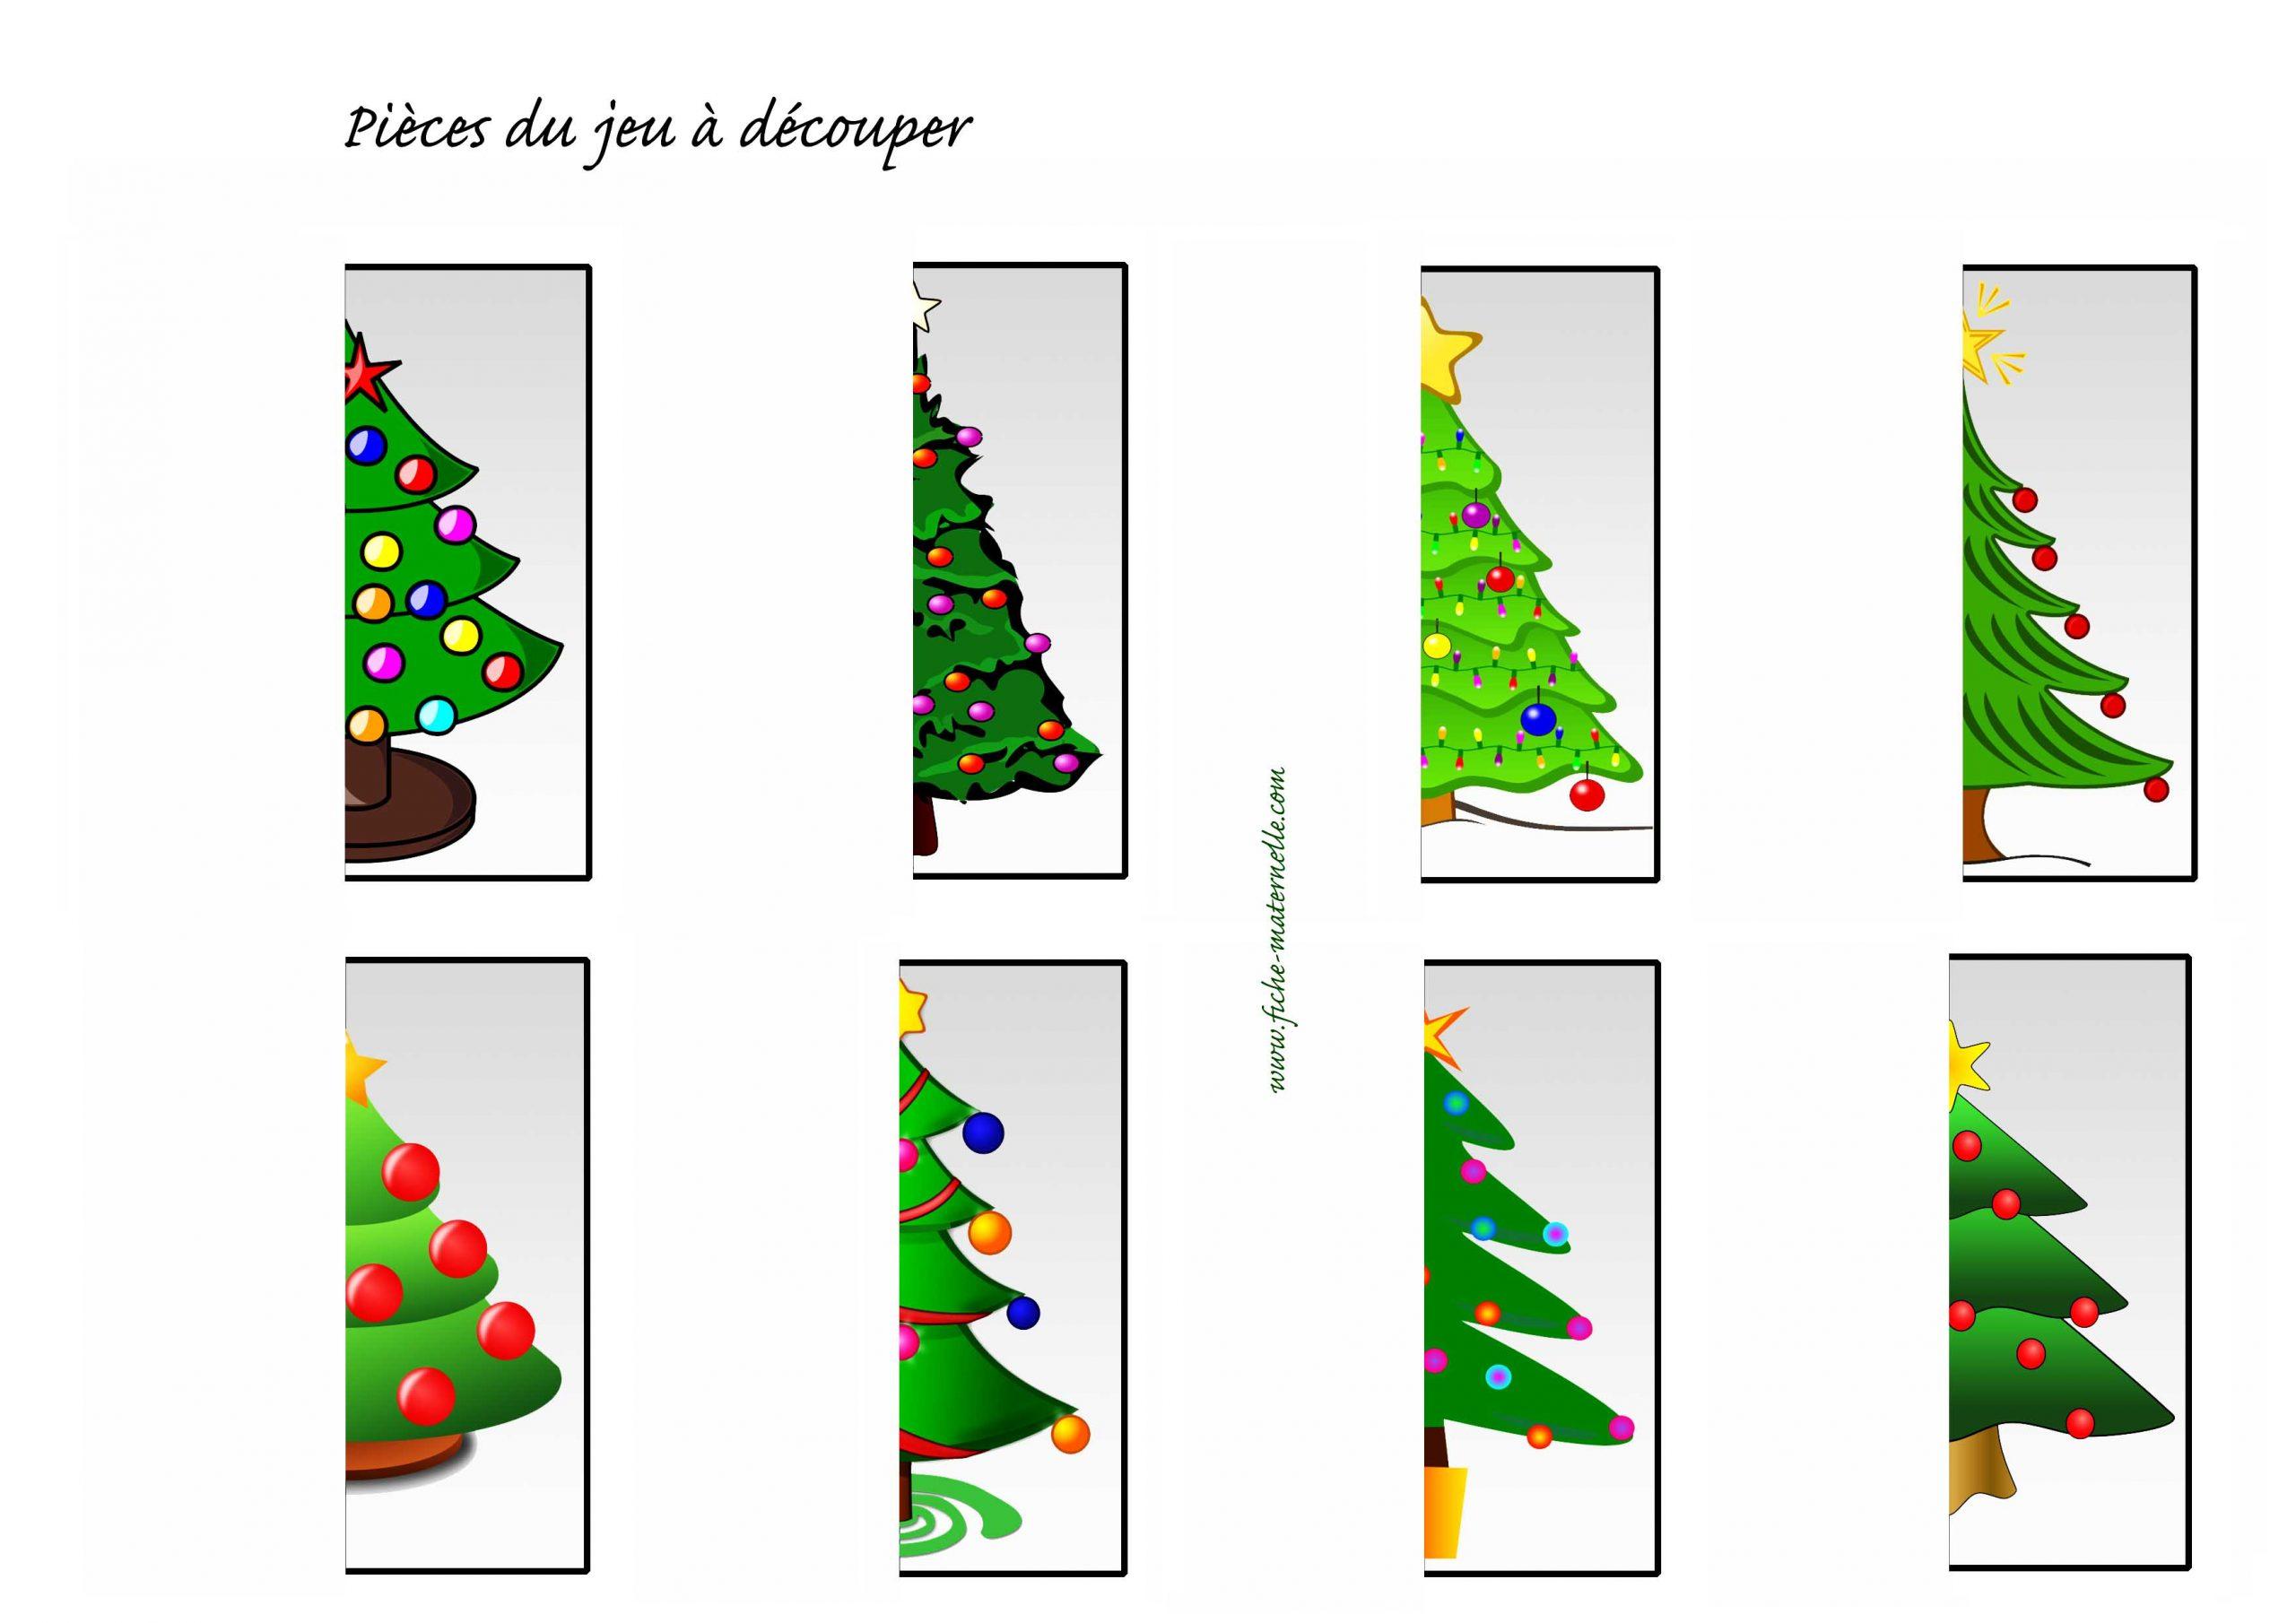 Jeu Mathématique En Maternelle concernant Jeu Noel Maternelle